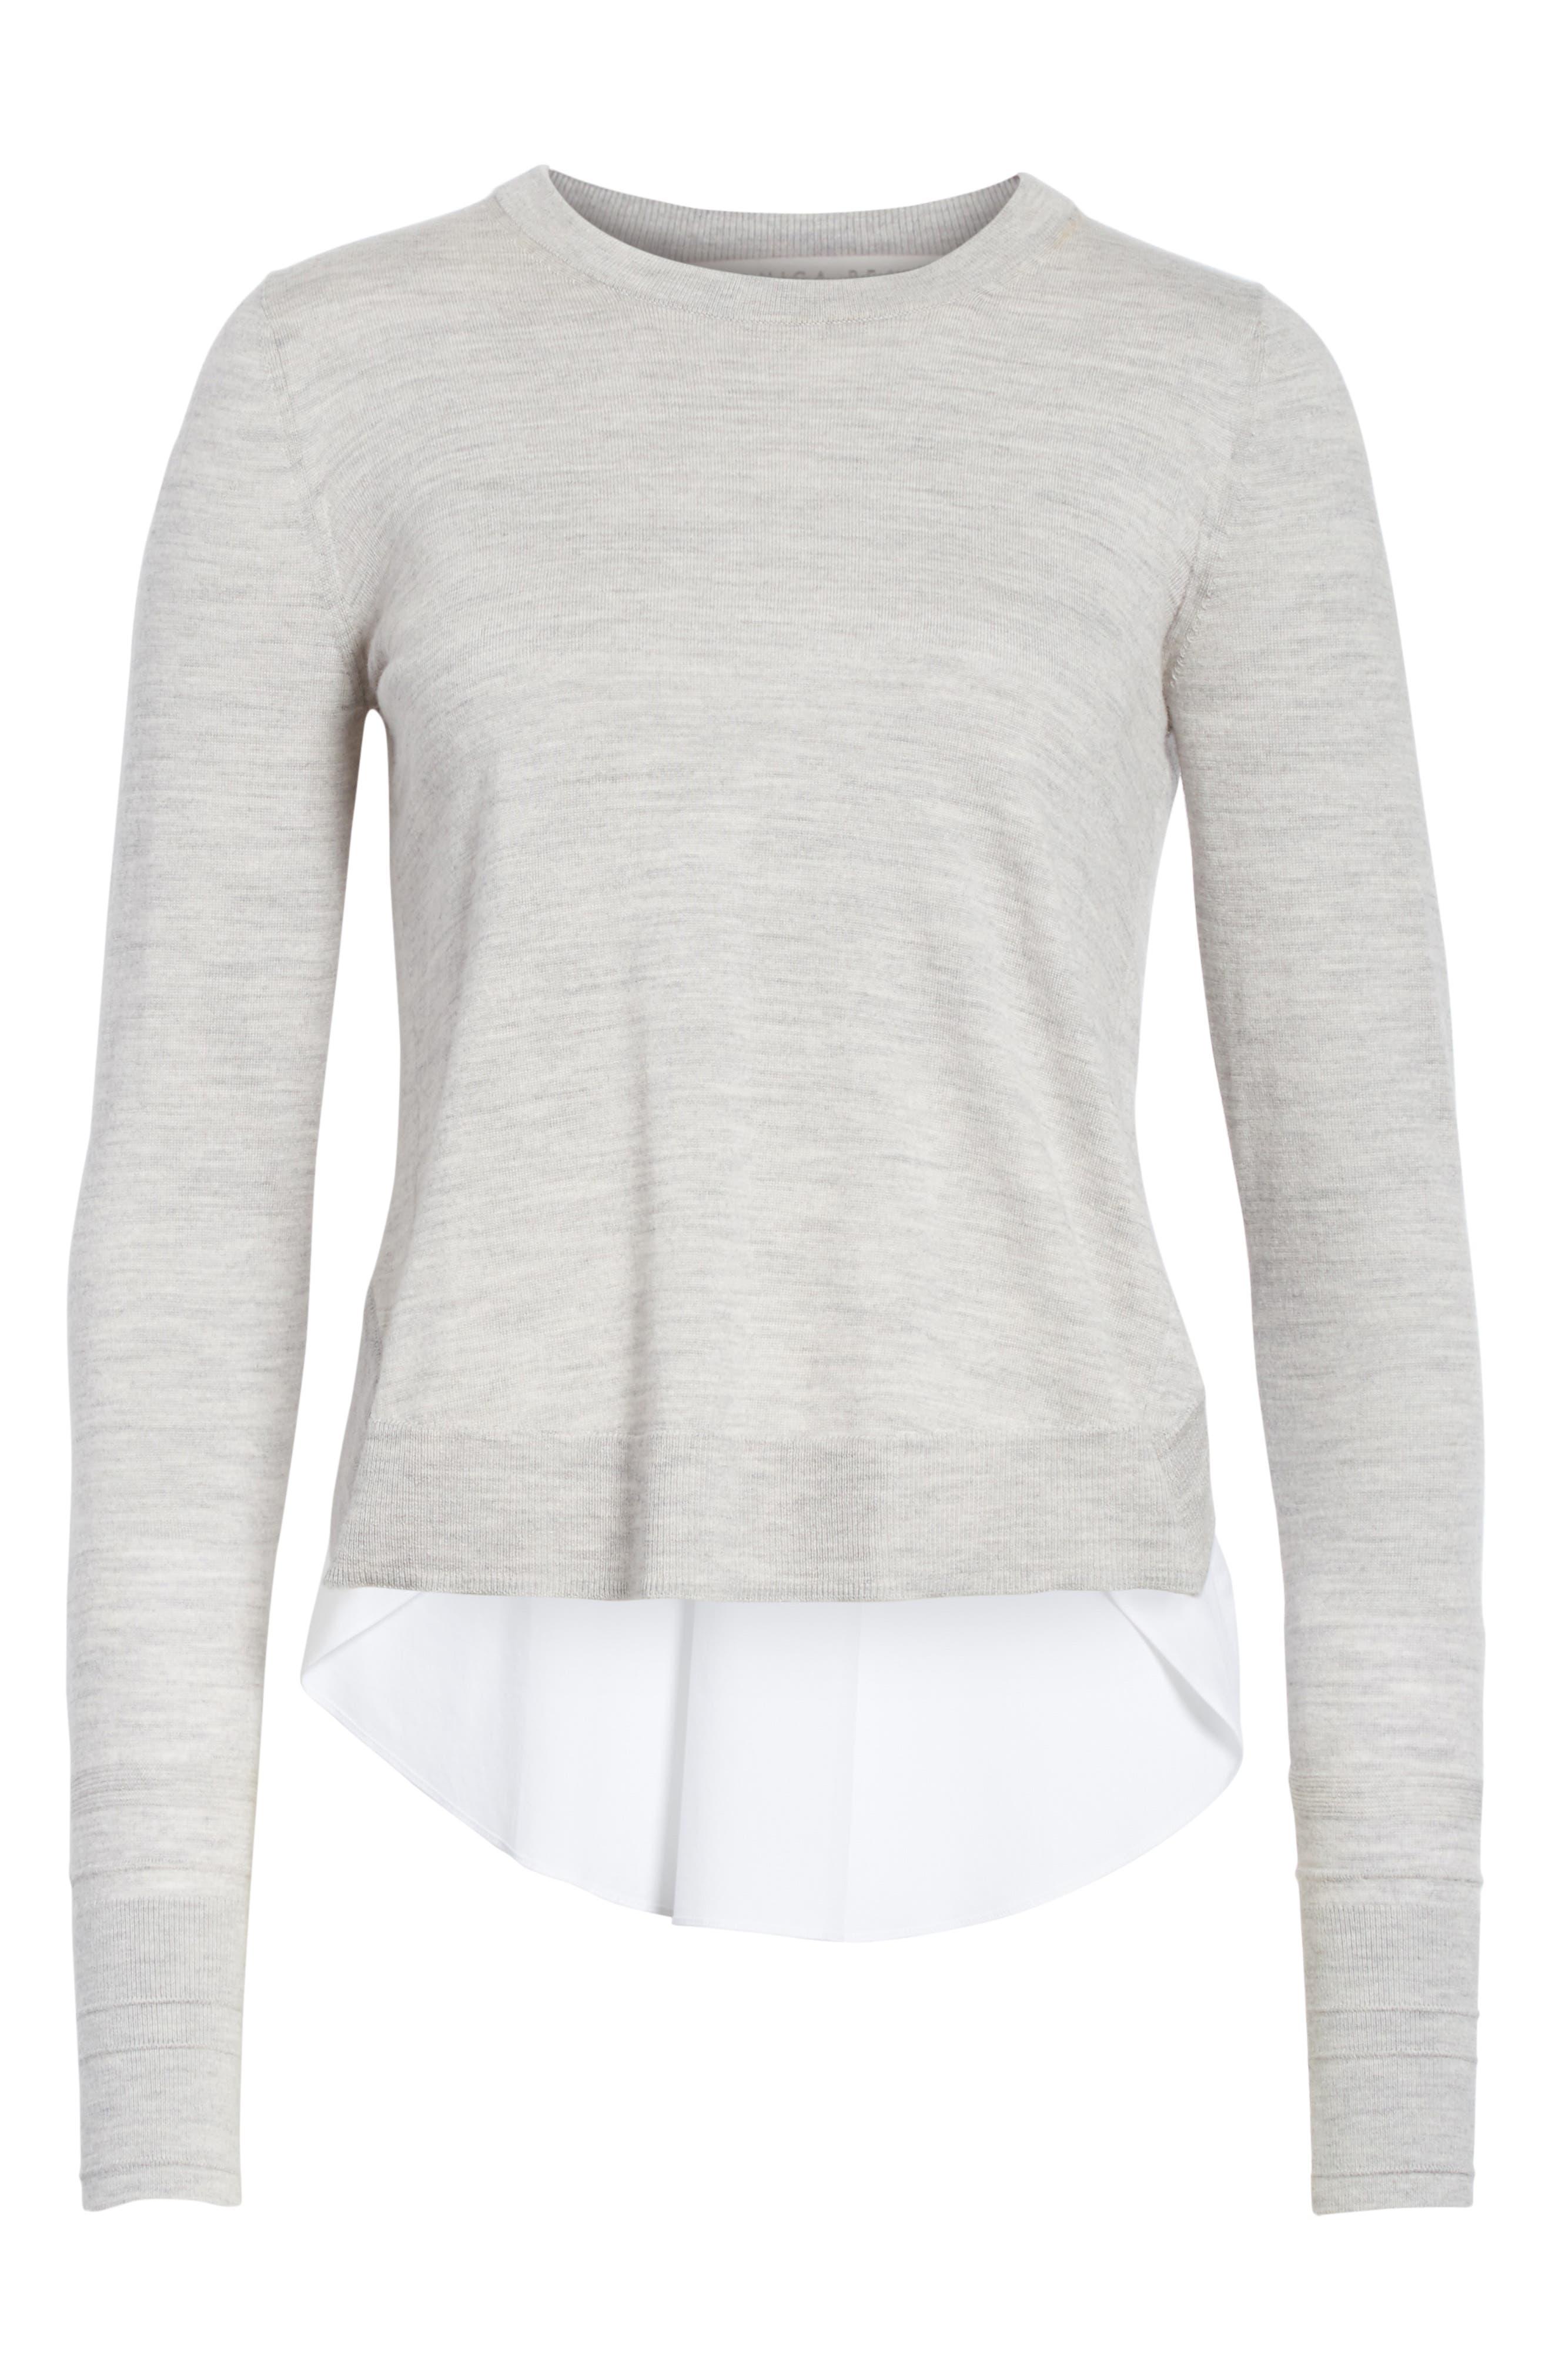 Alma Mixed Media Sweater,                             Alternate thumbnail 6, color,                             Heather Grey